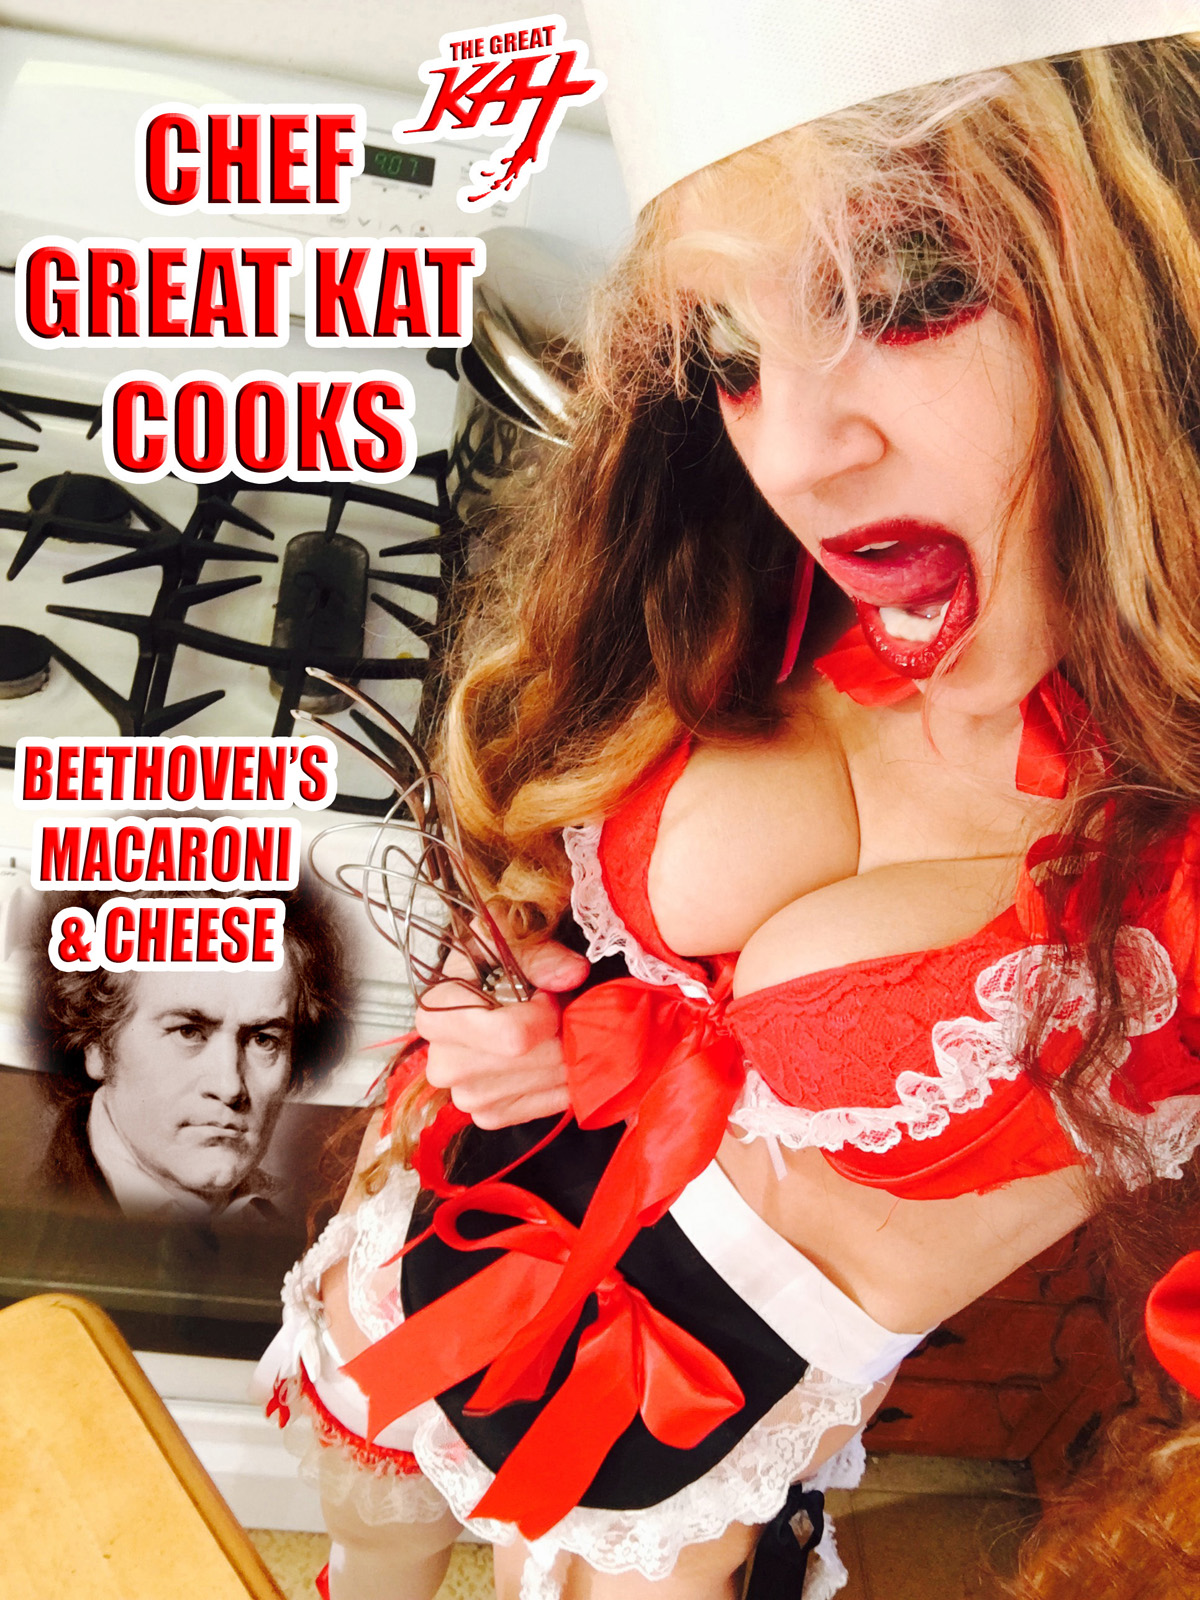 CHEF GREAT KAT COOKS BEETHOVEN'S MACARONI & CHEESE